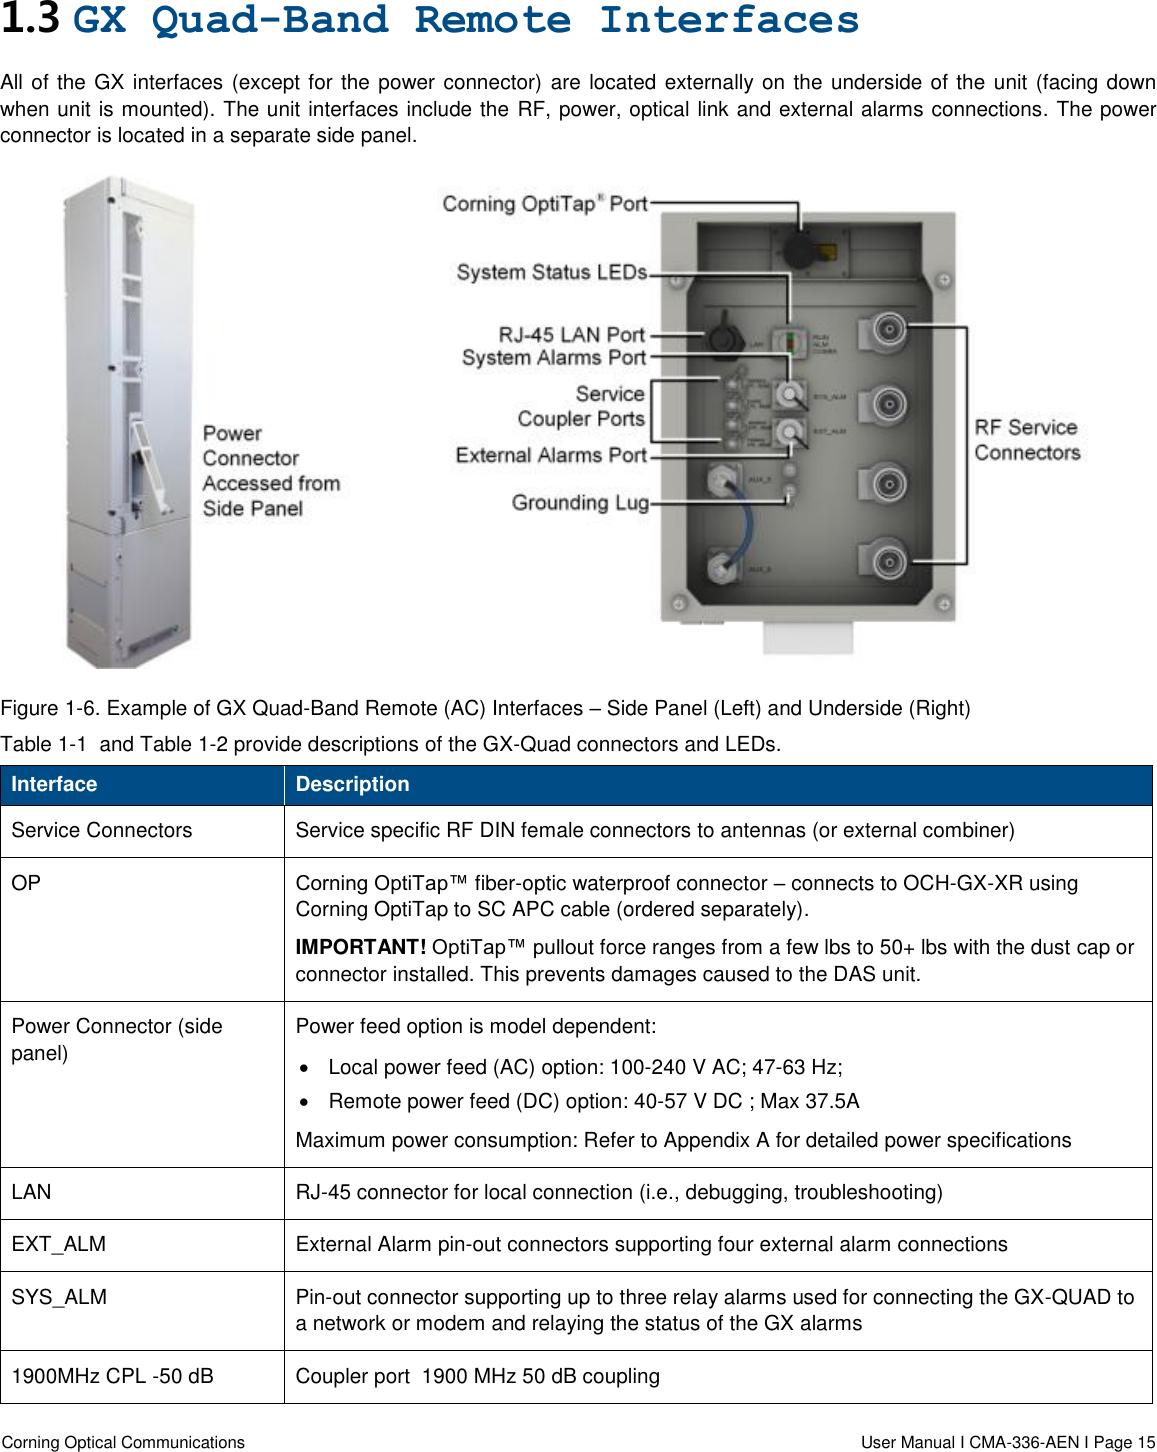 Corning Optical Communication Wireless GXCPLA3 GX 40W Quad